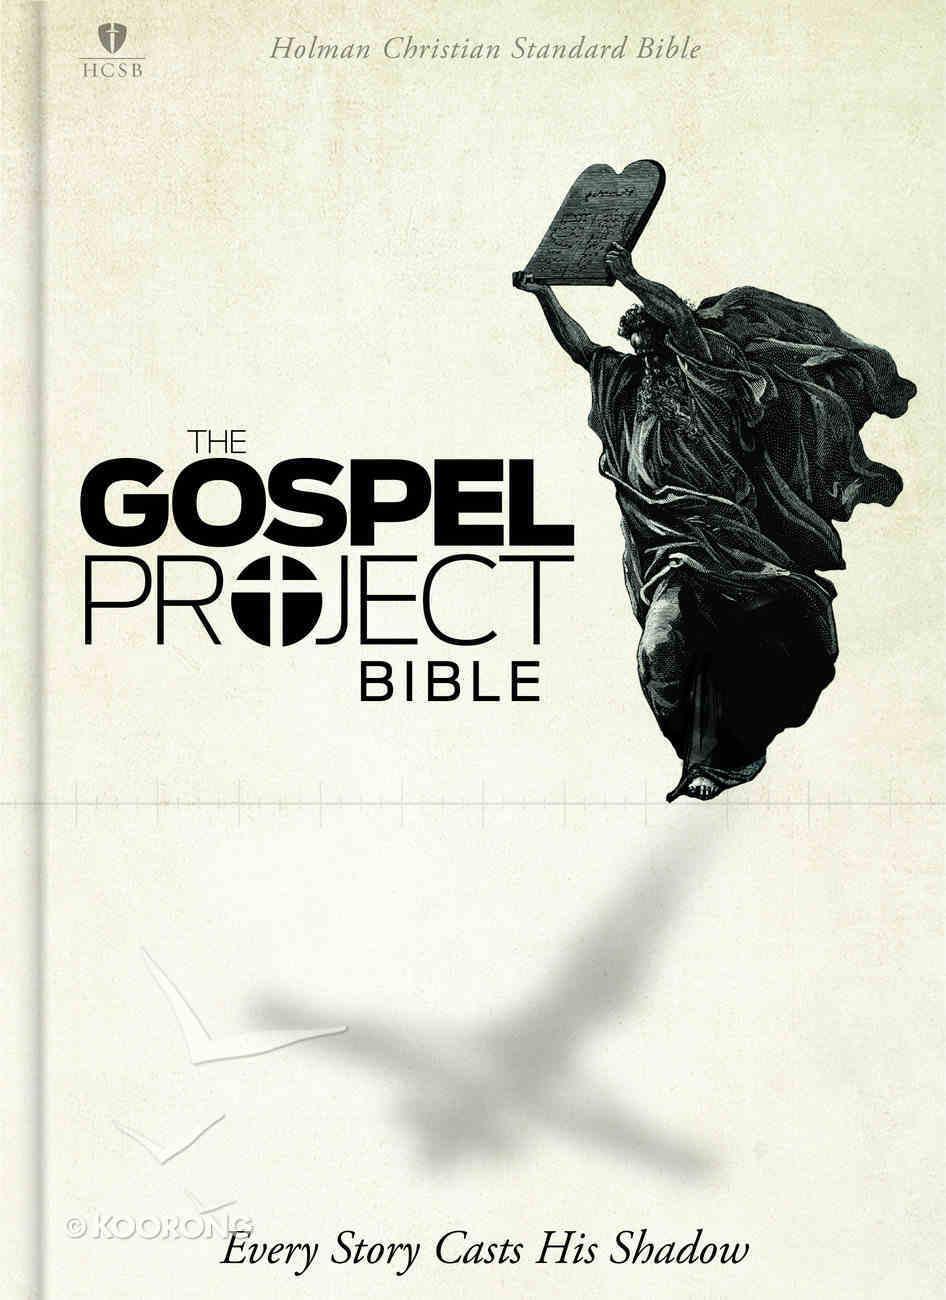 The HCSB Gospel Project Bible Hardback